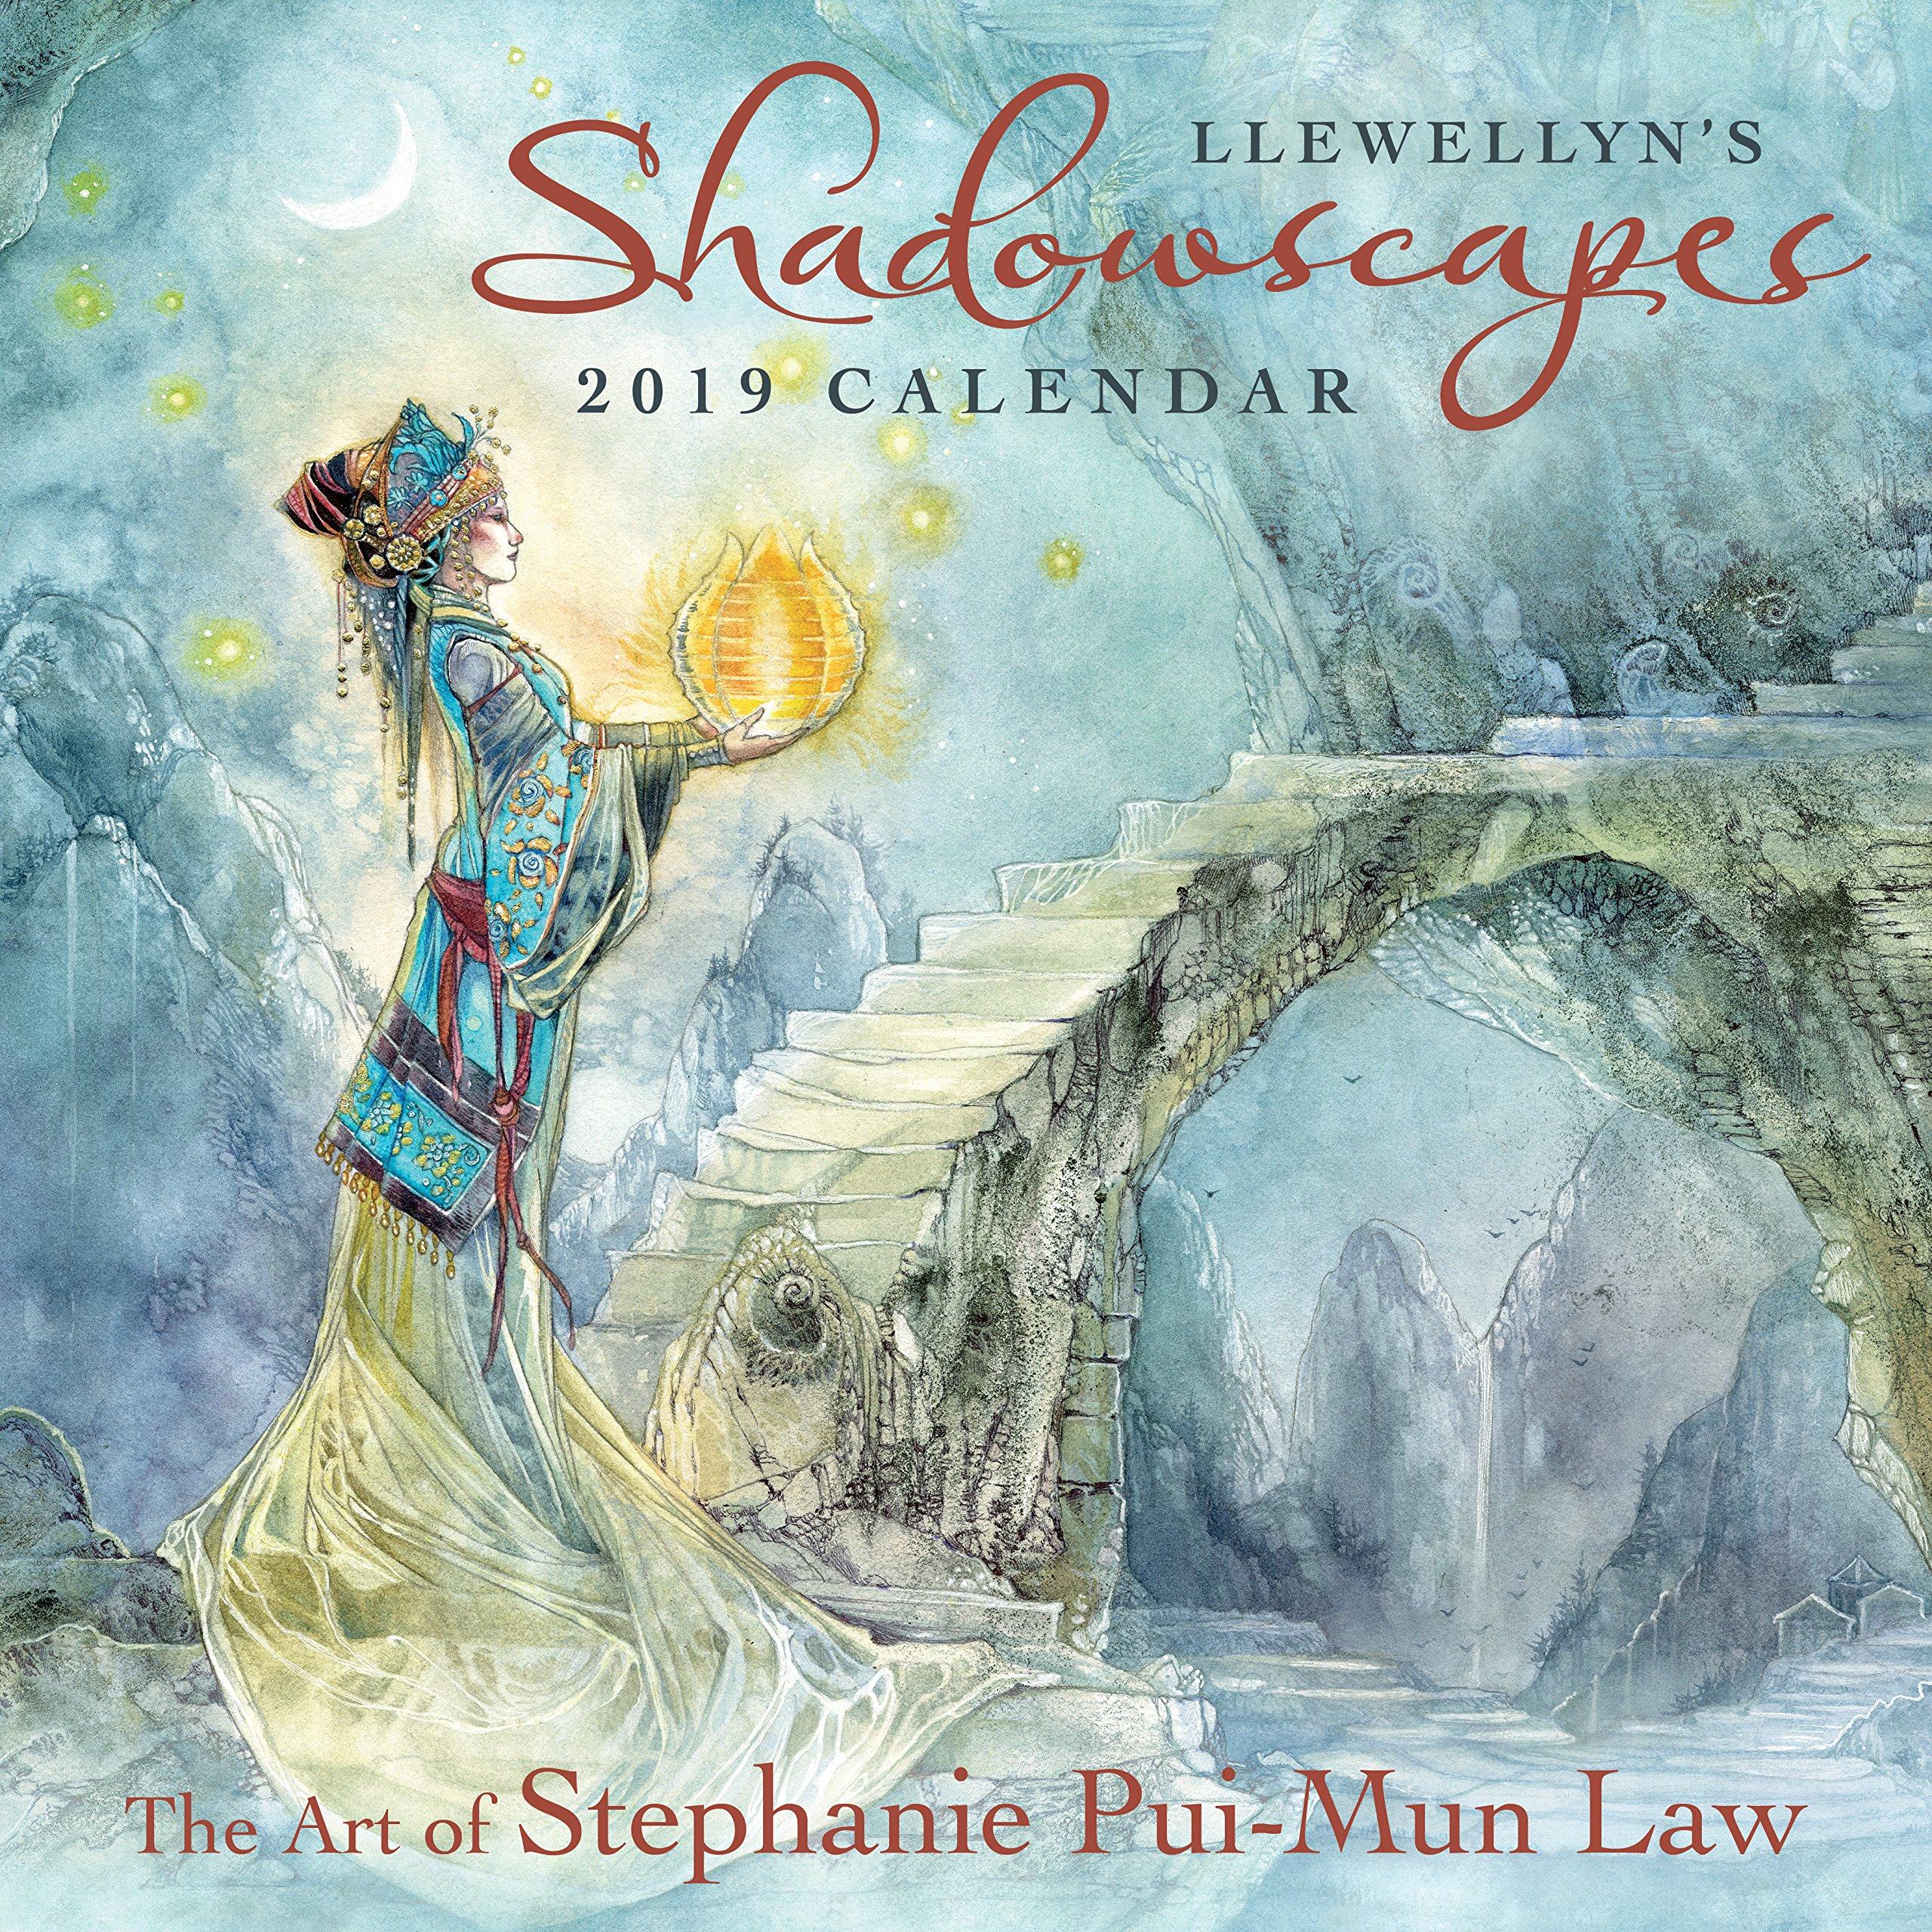 Llewellyns 2019 Shadowscapes Calendar: Stephanie Pui-Mun ...